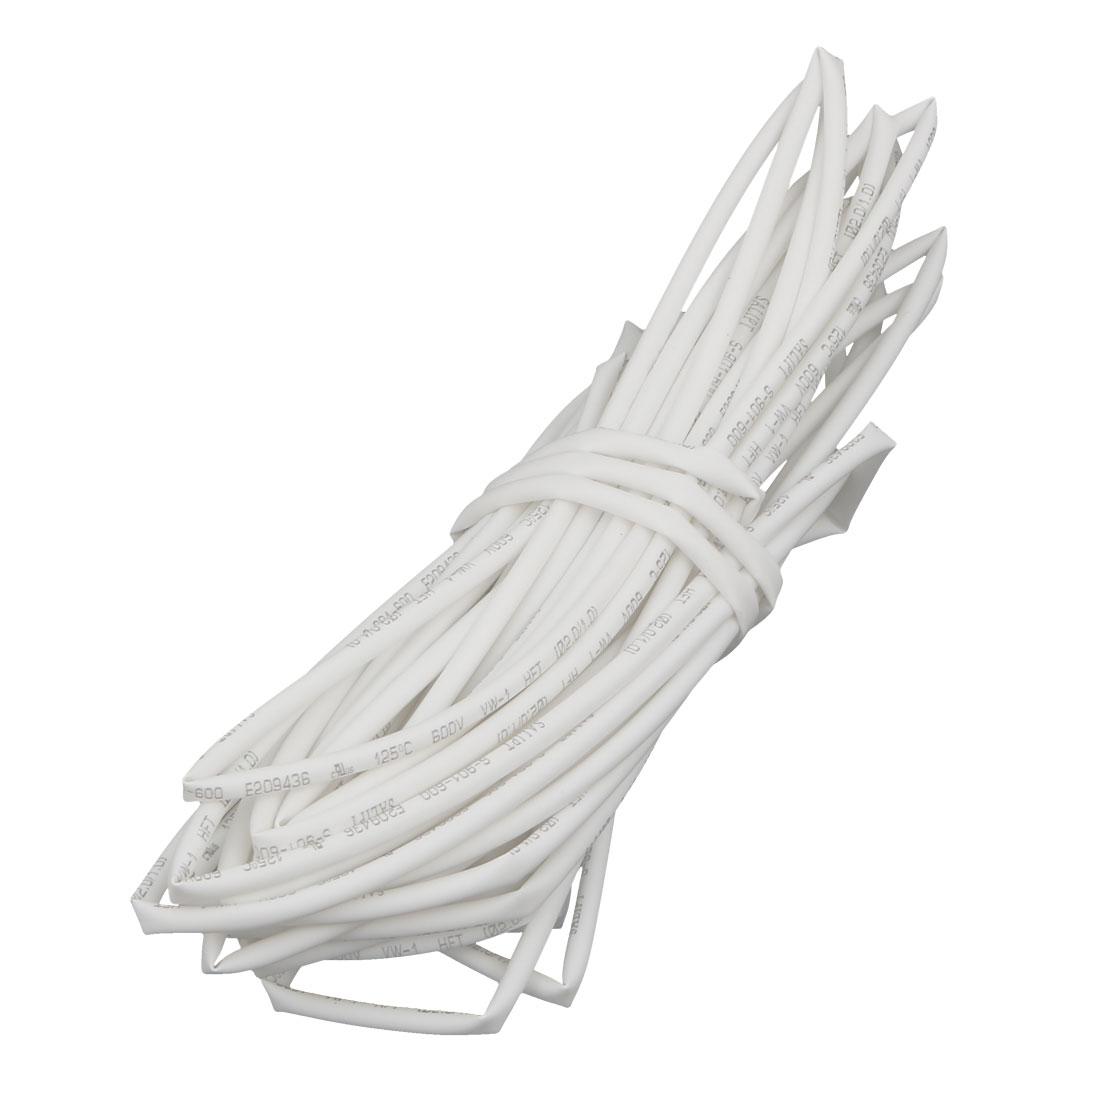 26.2Ft Length 2mm Inner Dia Insulated Heat Shrink Tube Sleeve Wire Wrap White